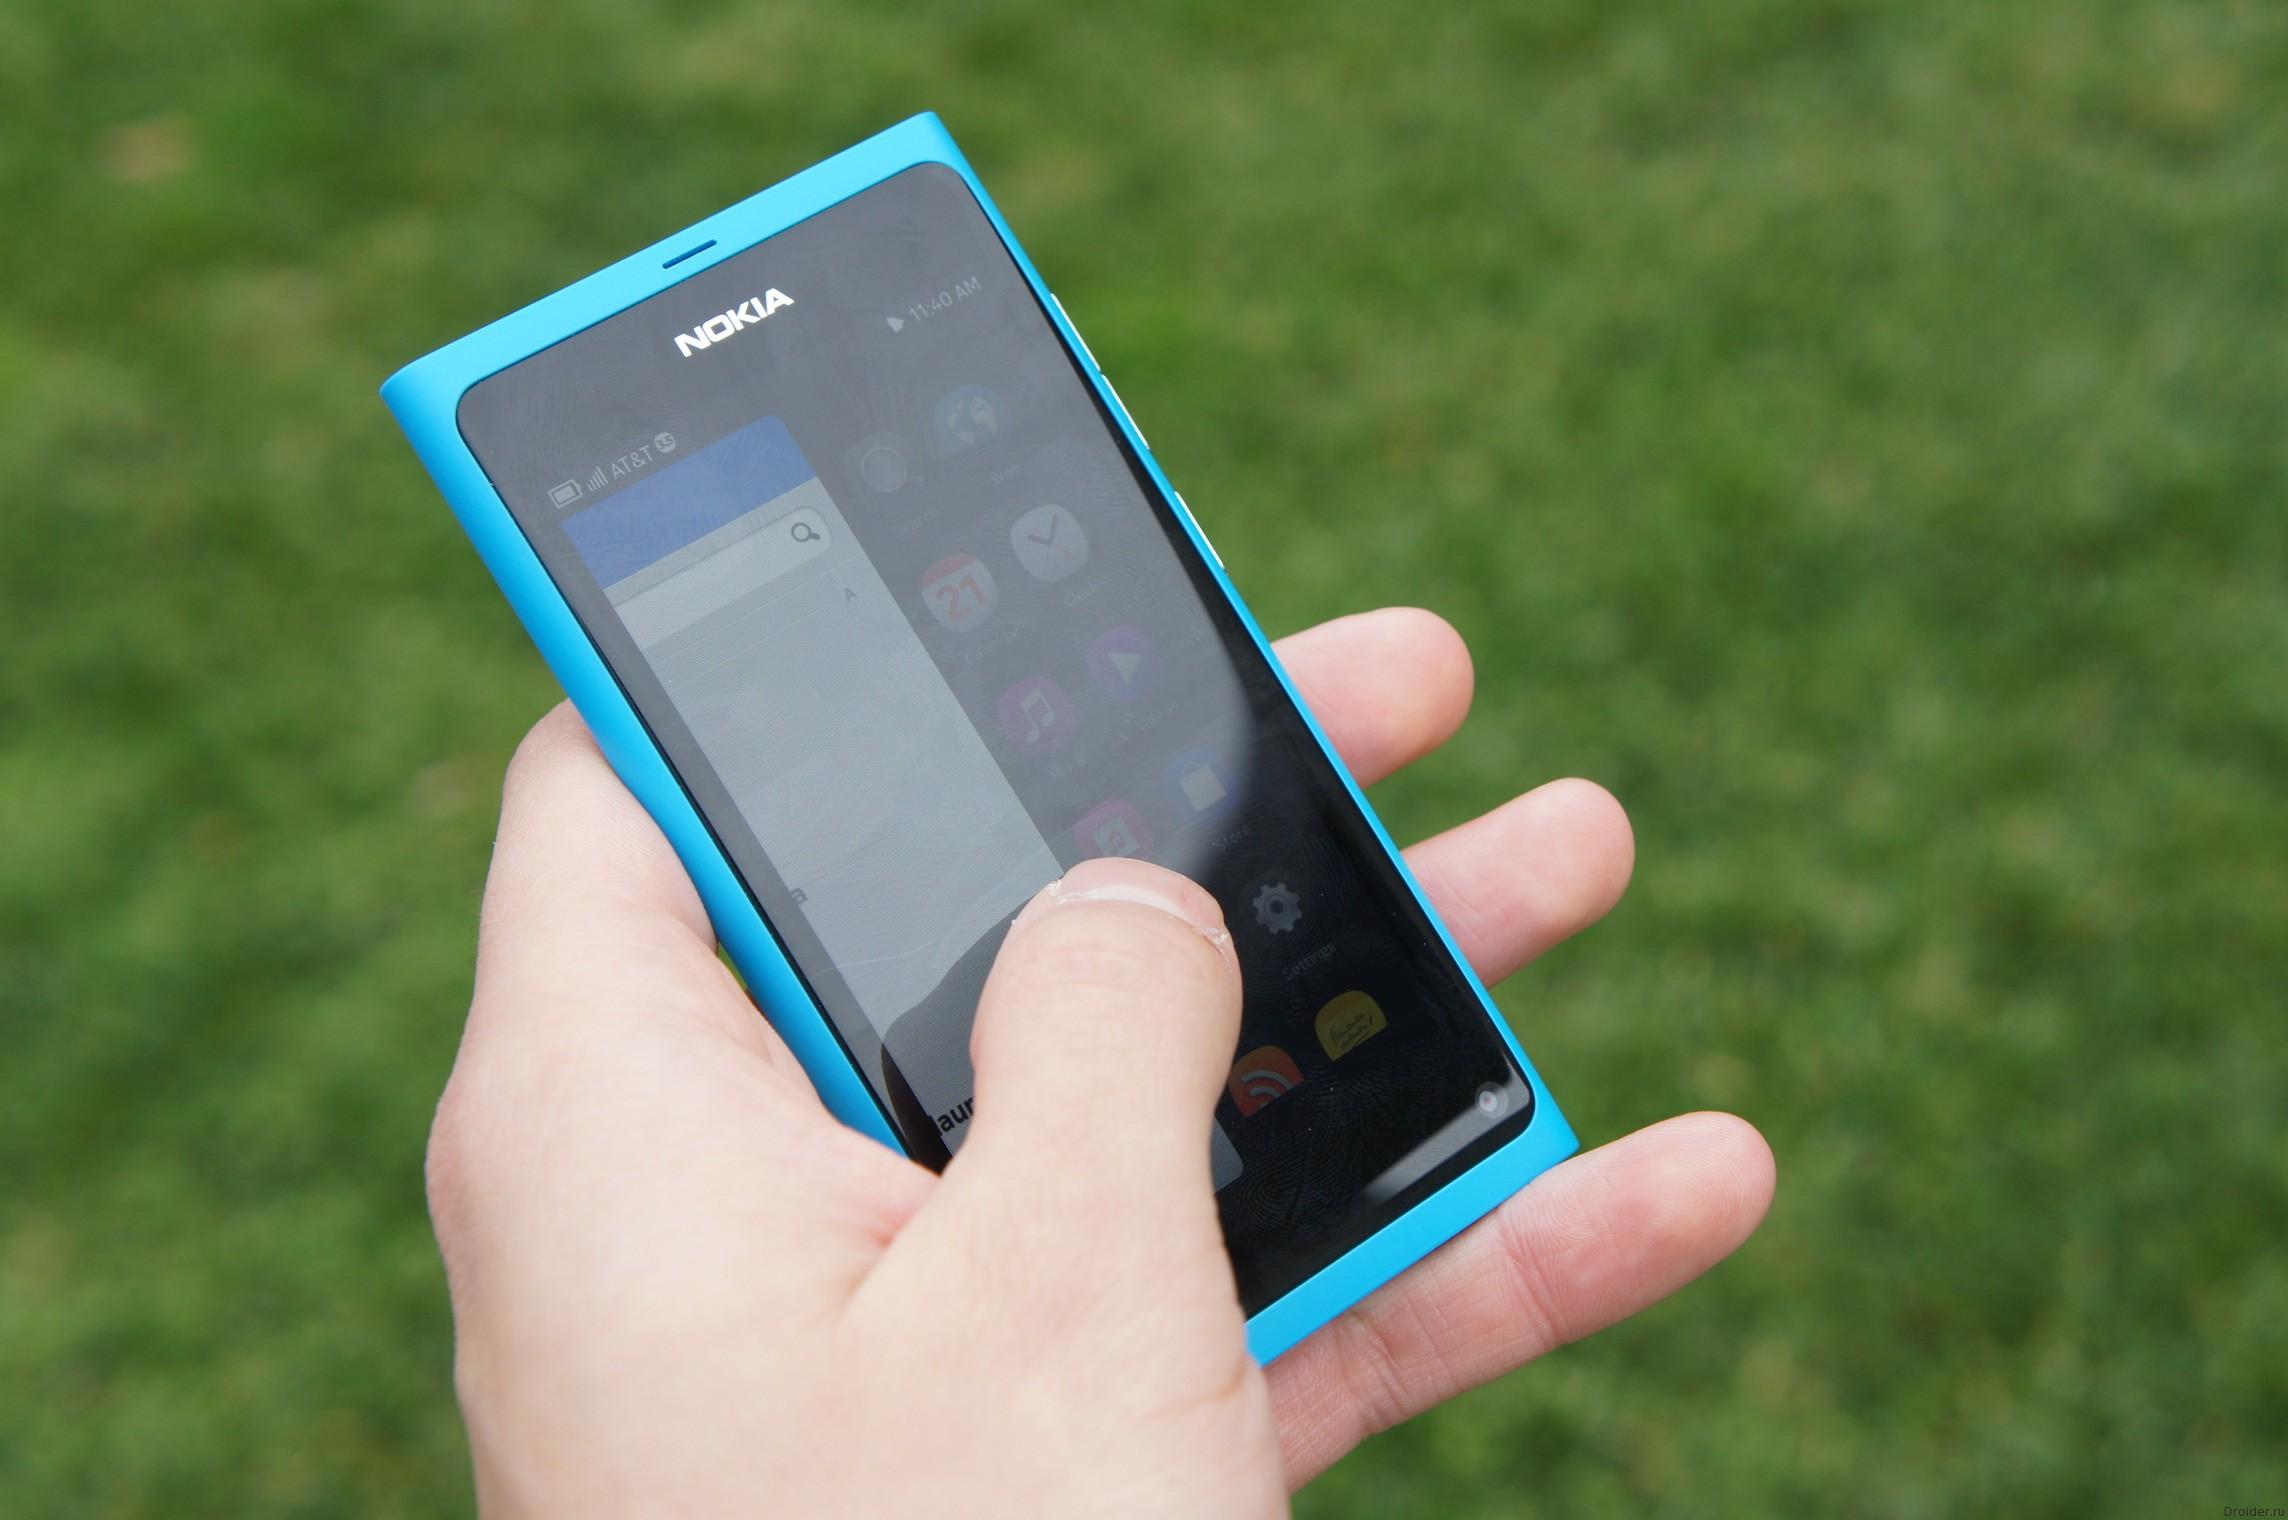 Смартфон N9 от Nokia из 2011 года